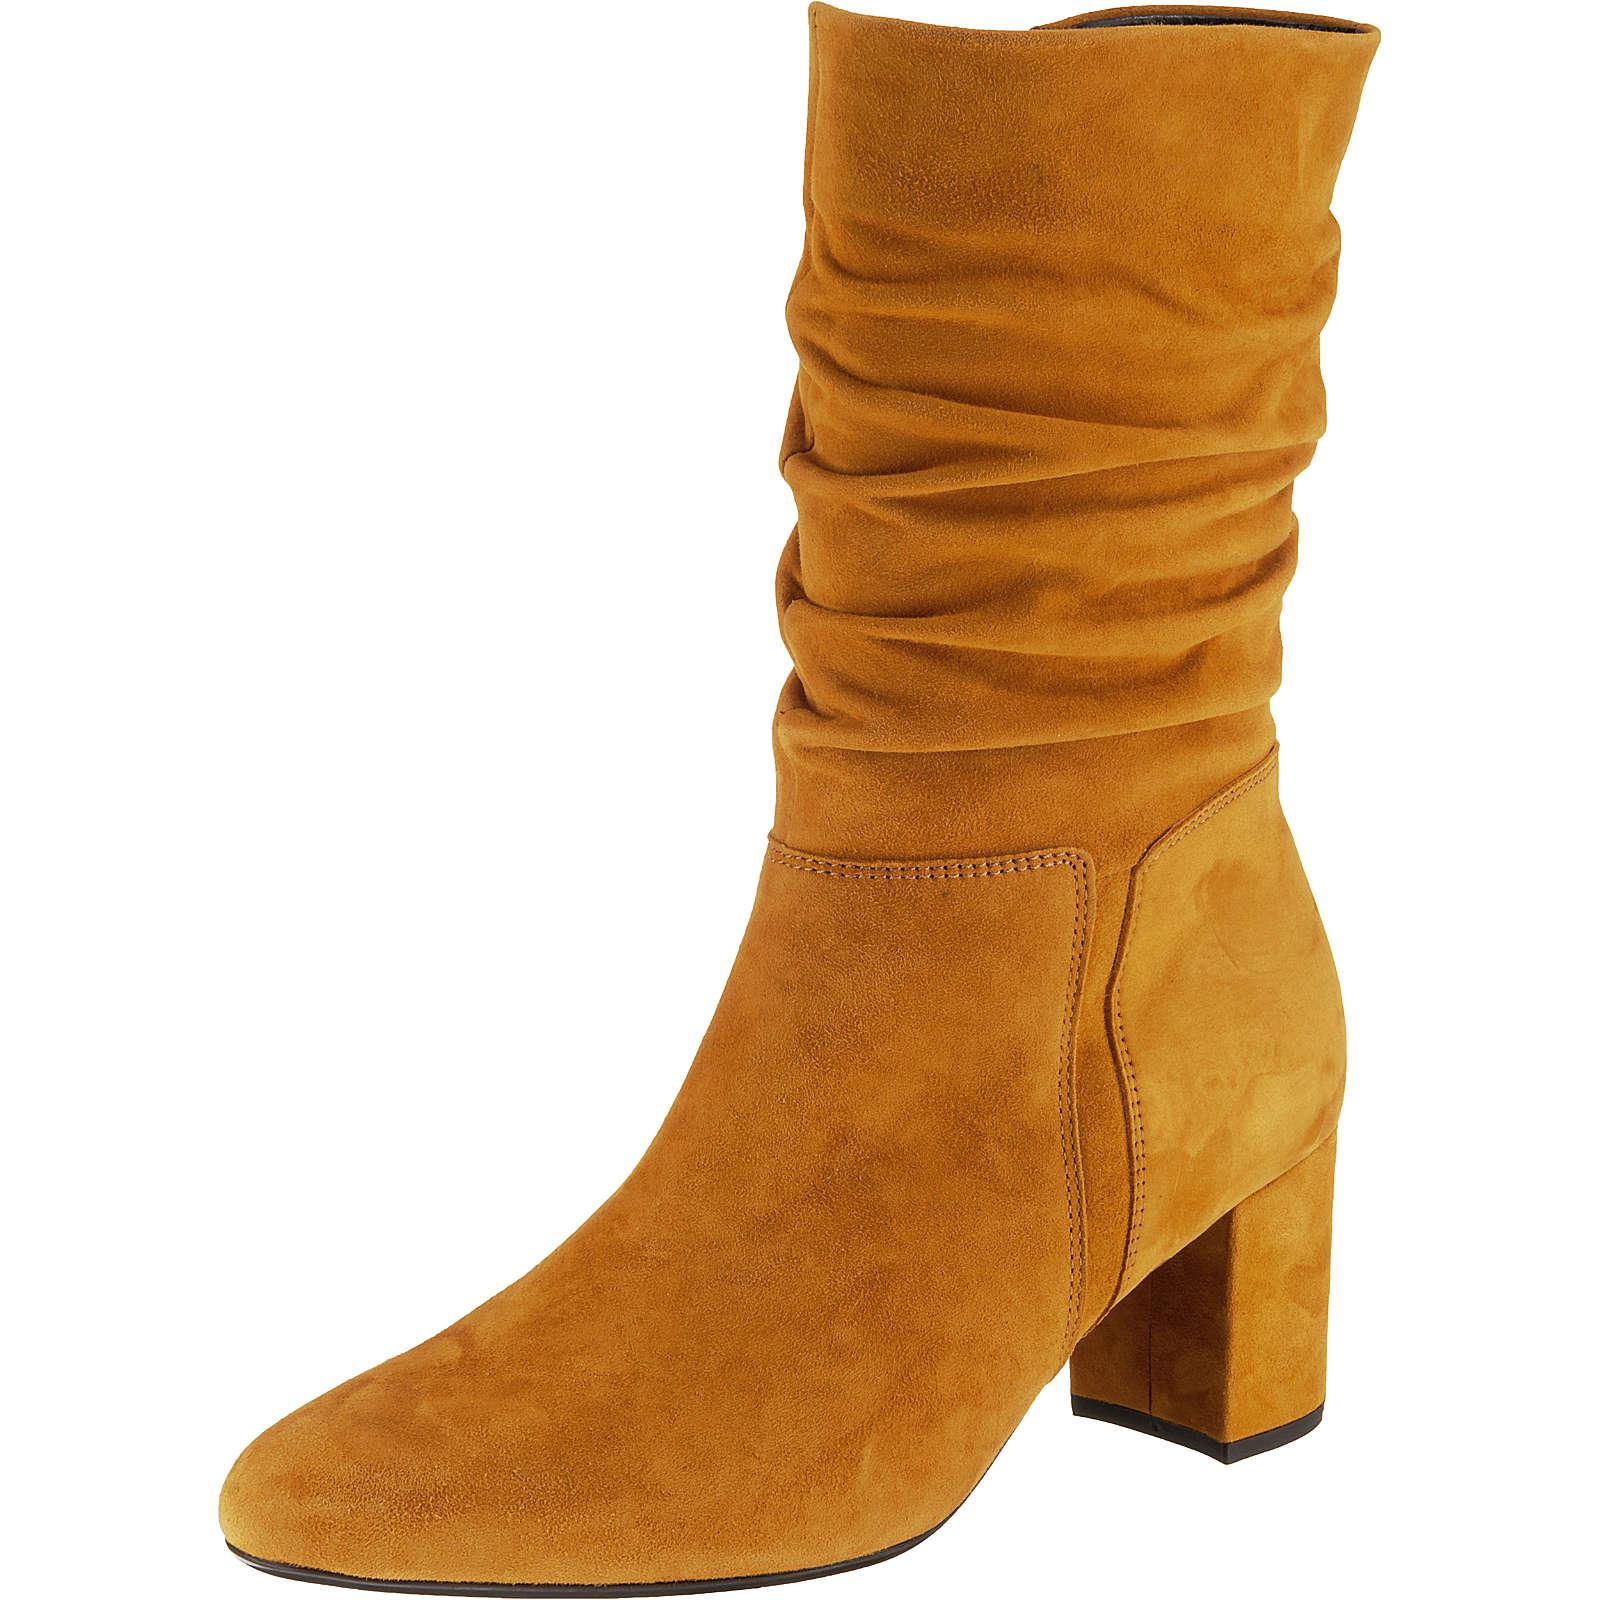 Gabor Klassische Stiefel gelb Damen Gr. 42